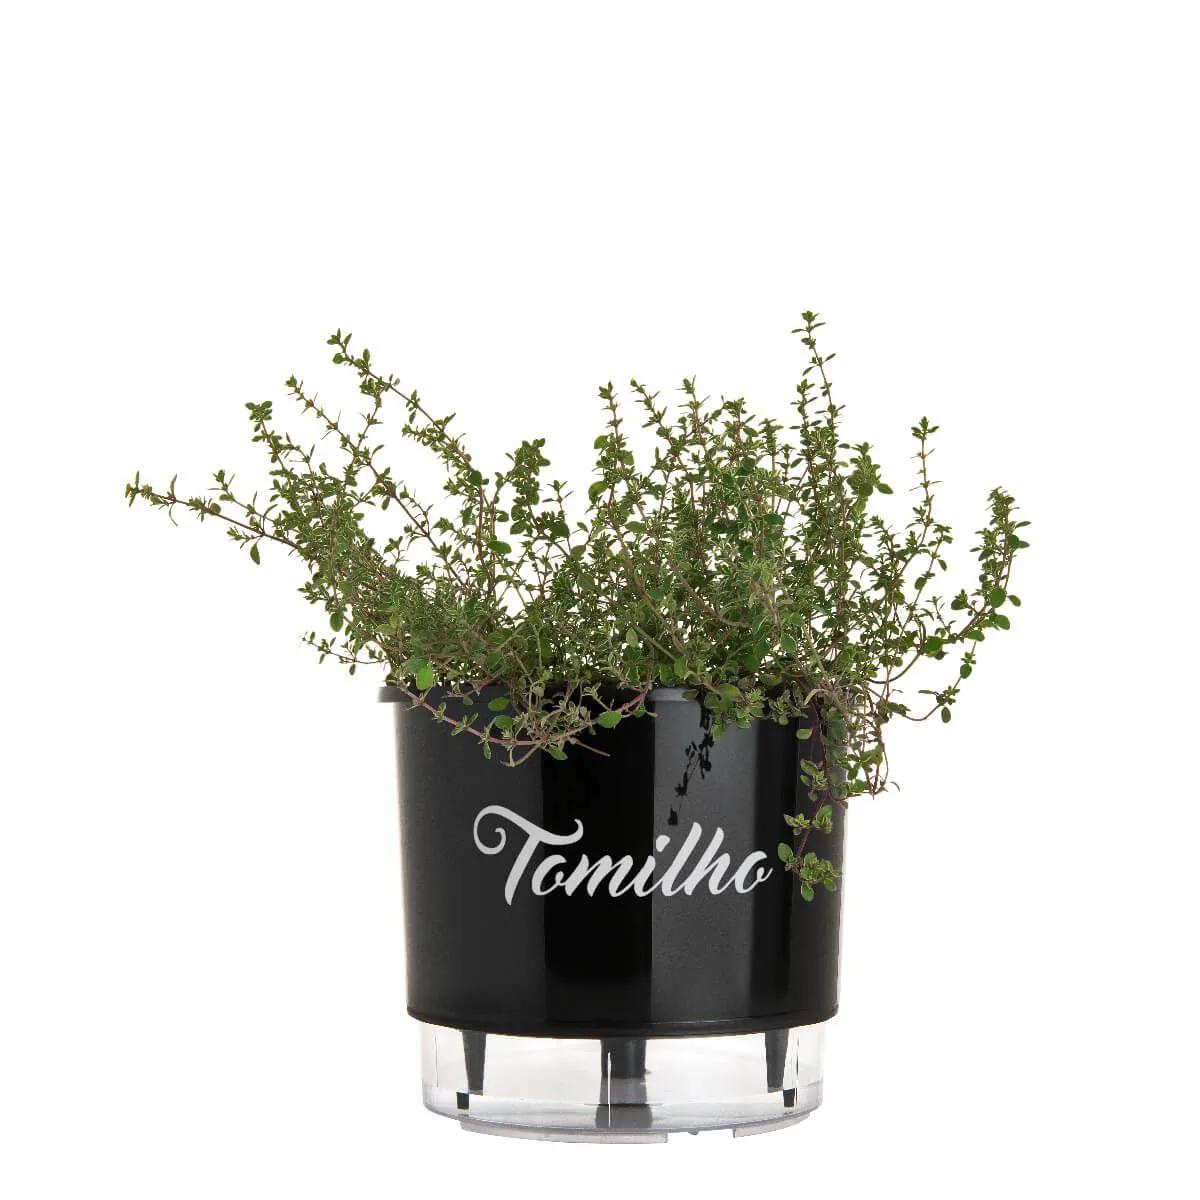 Vaso Autoirrigável Médio Preto Coleção Gourmet 16cm x 14cm Tomilho  - Vasos Raiz Loja Oficial